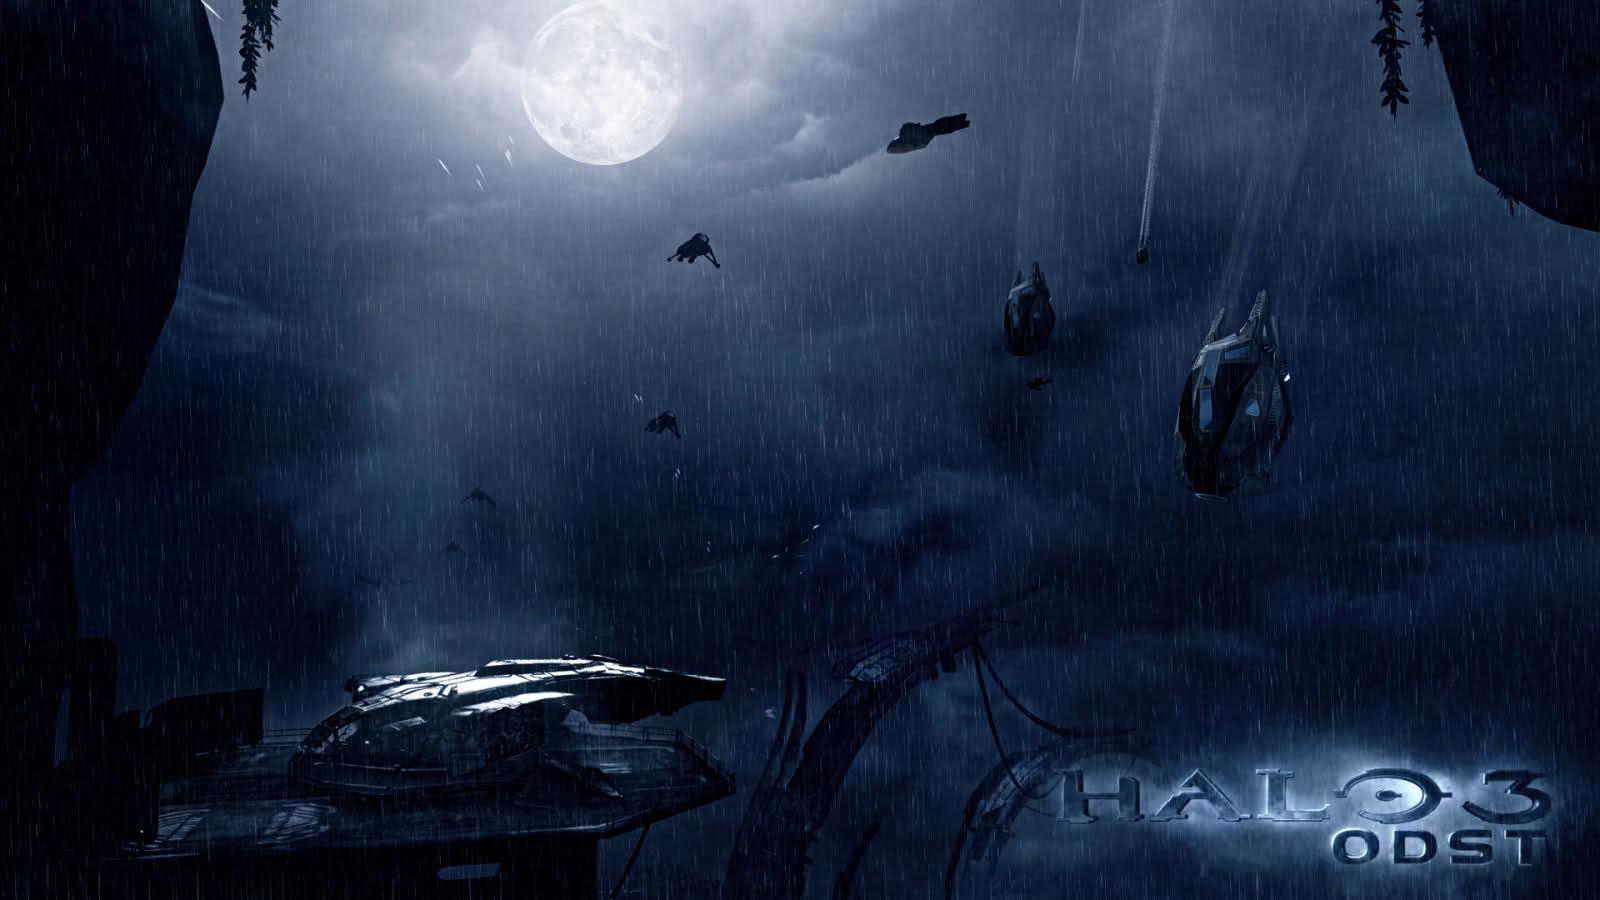 Bungie net : Halo 3: ODST Forum : Photoshop - Halo 3 ODST Wallpaper 3